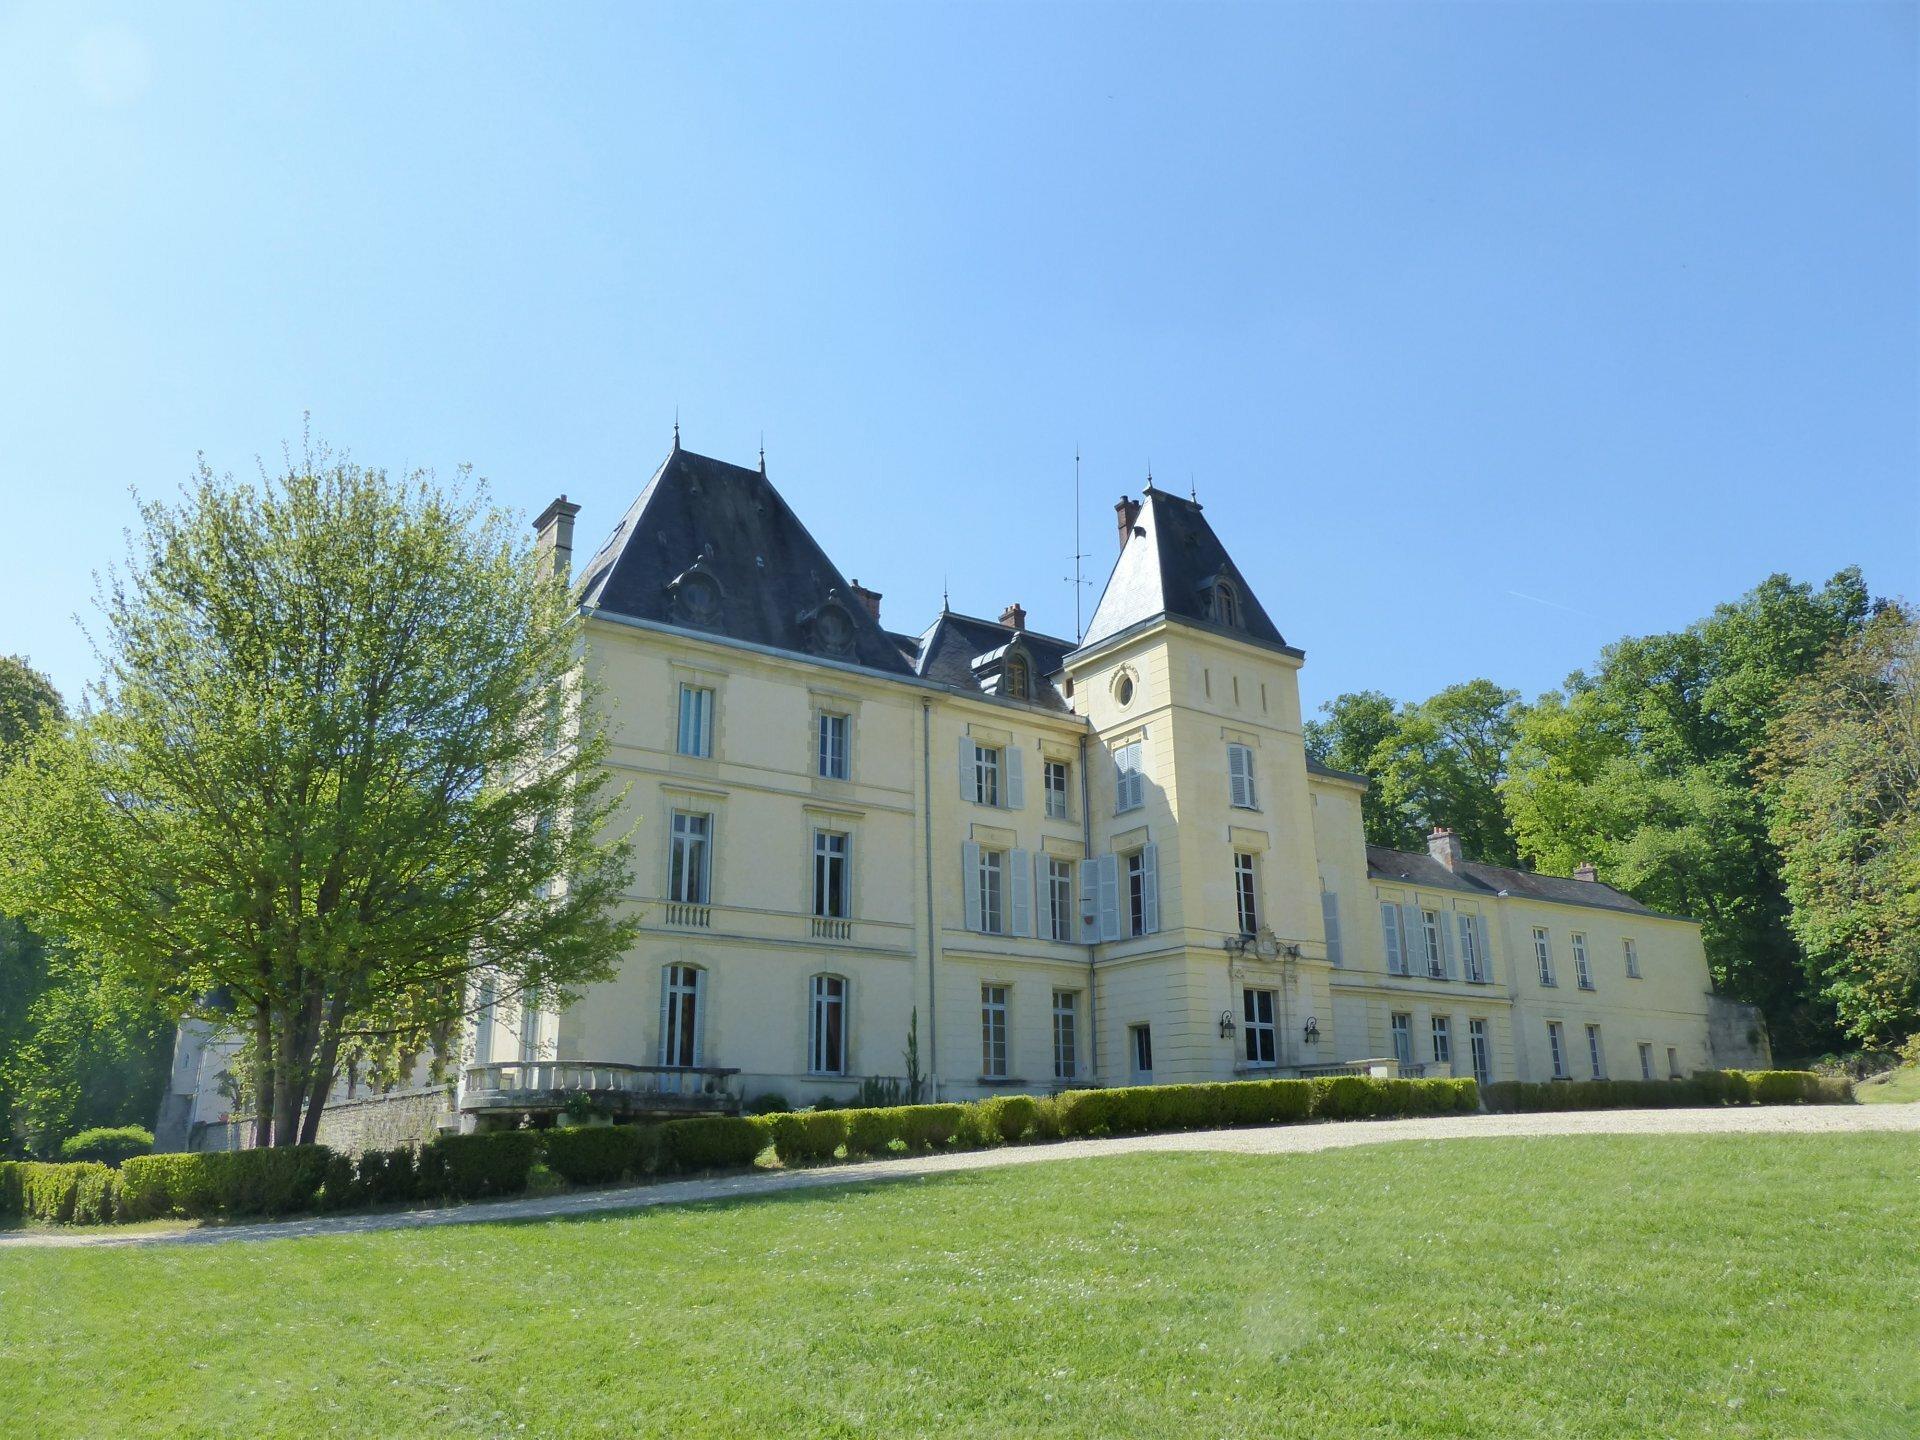 House in Milly-la-Forêt, Île-de-France, France 1